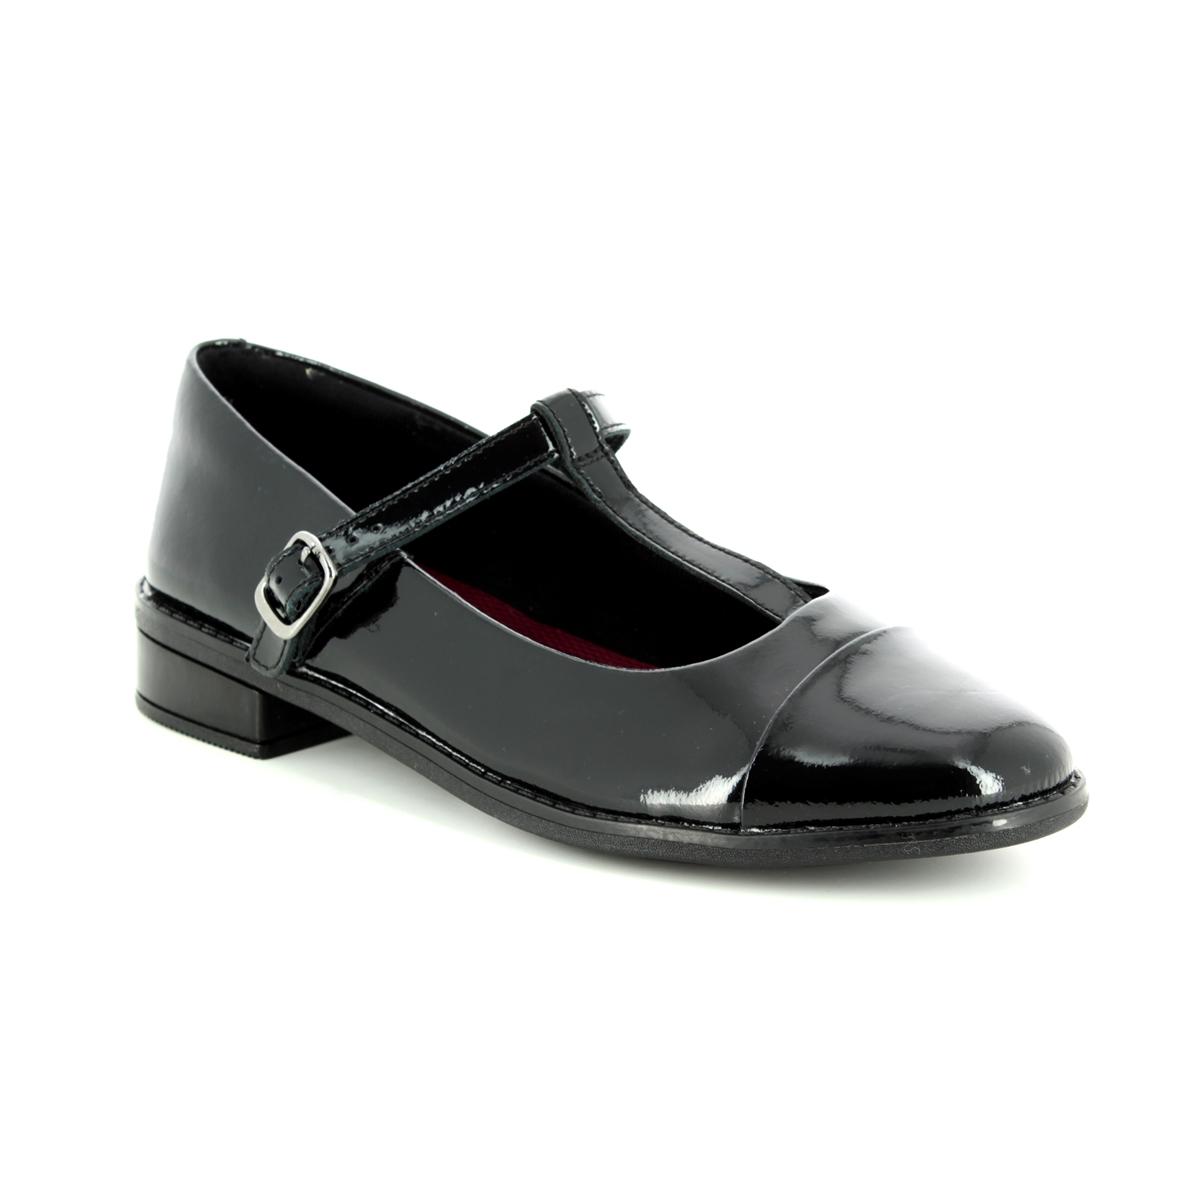 8fbf0476a74 Clarks School Shoes - Black Patent Leather - 3491/76F DREW SHINE